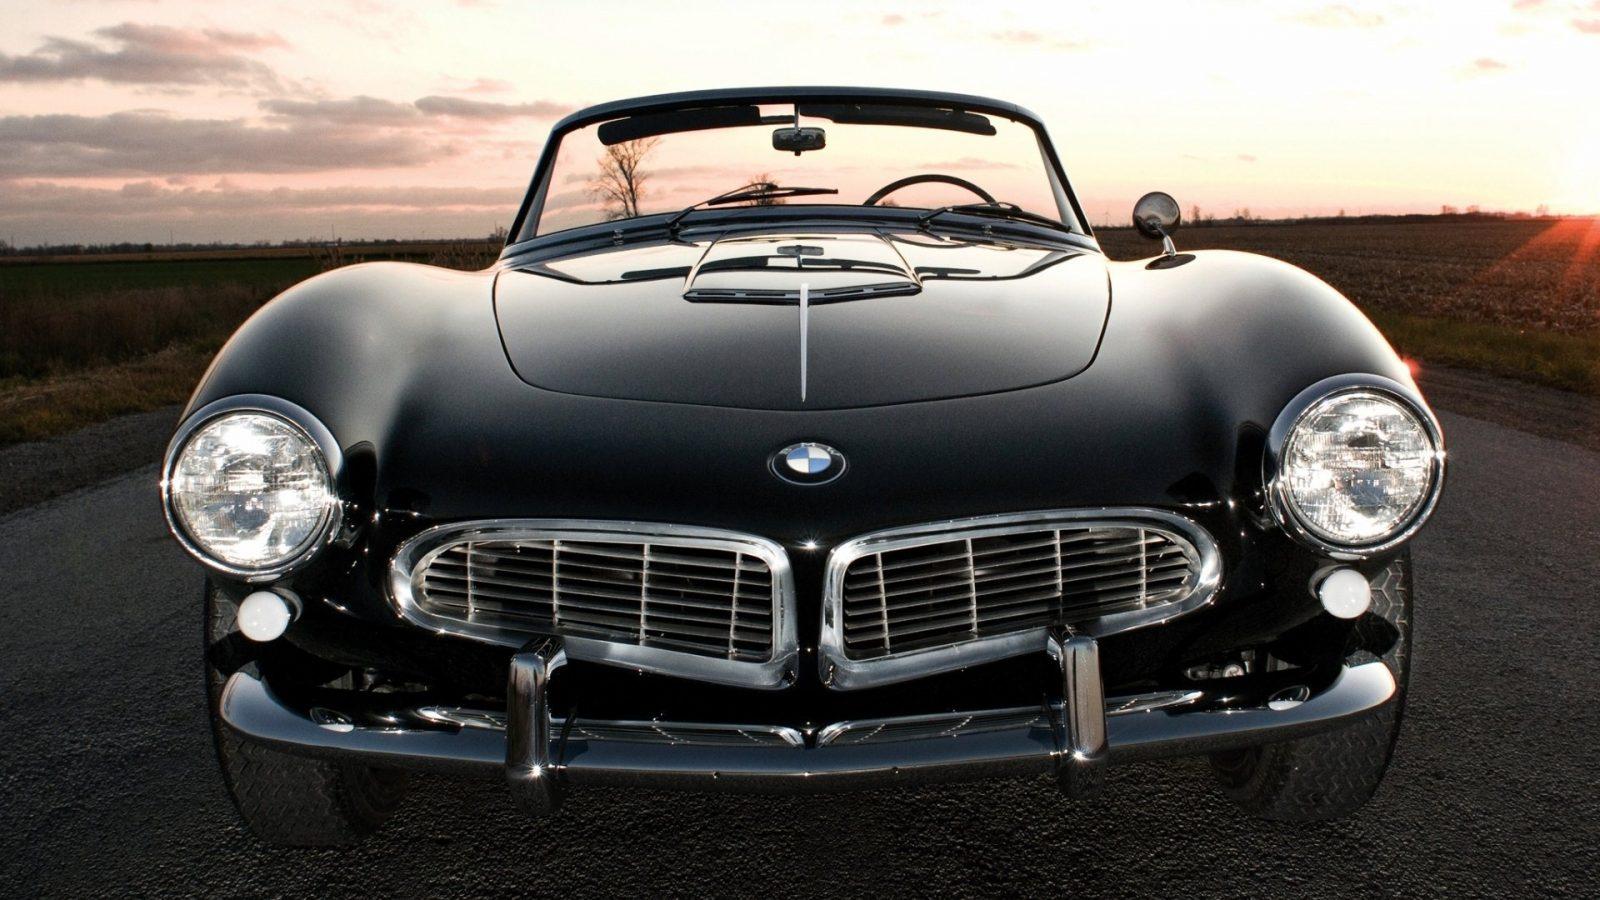 Bmw Classic Car Wallpaper Hd Wallpaper Background